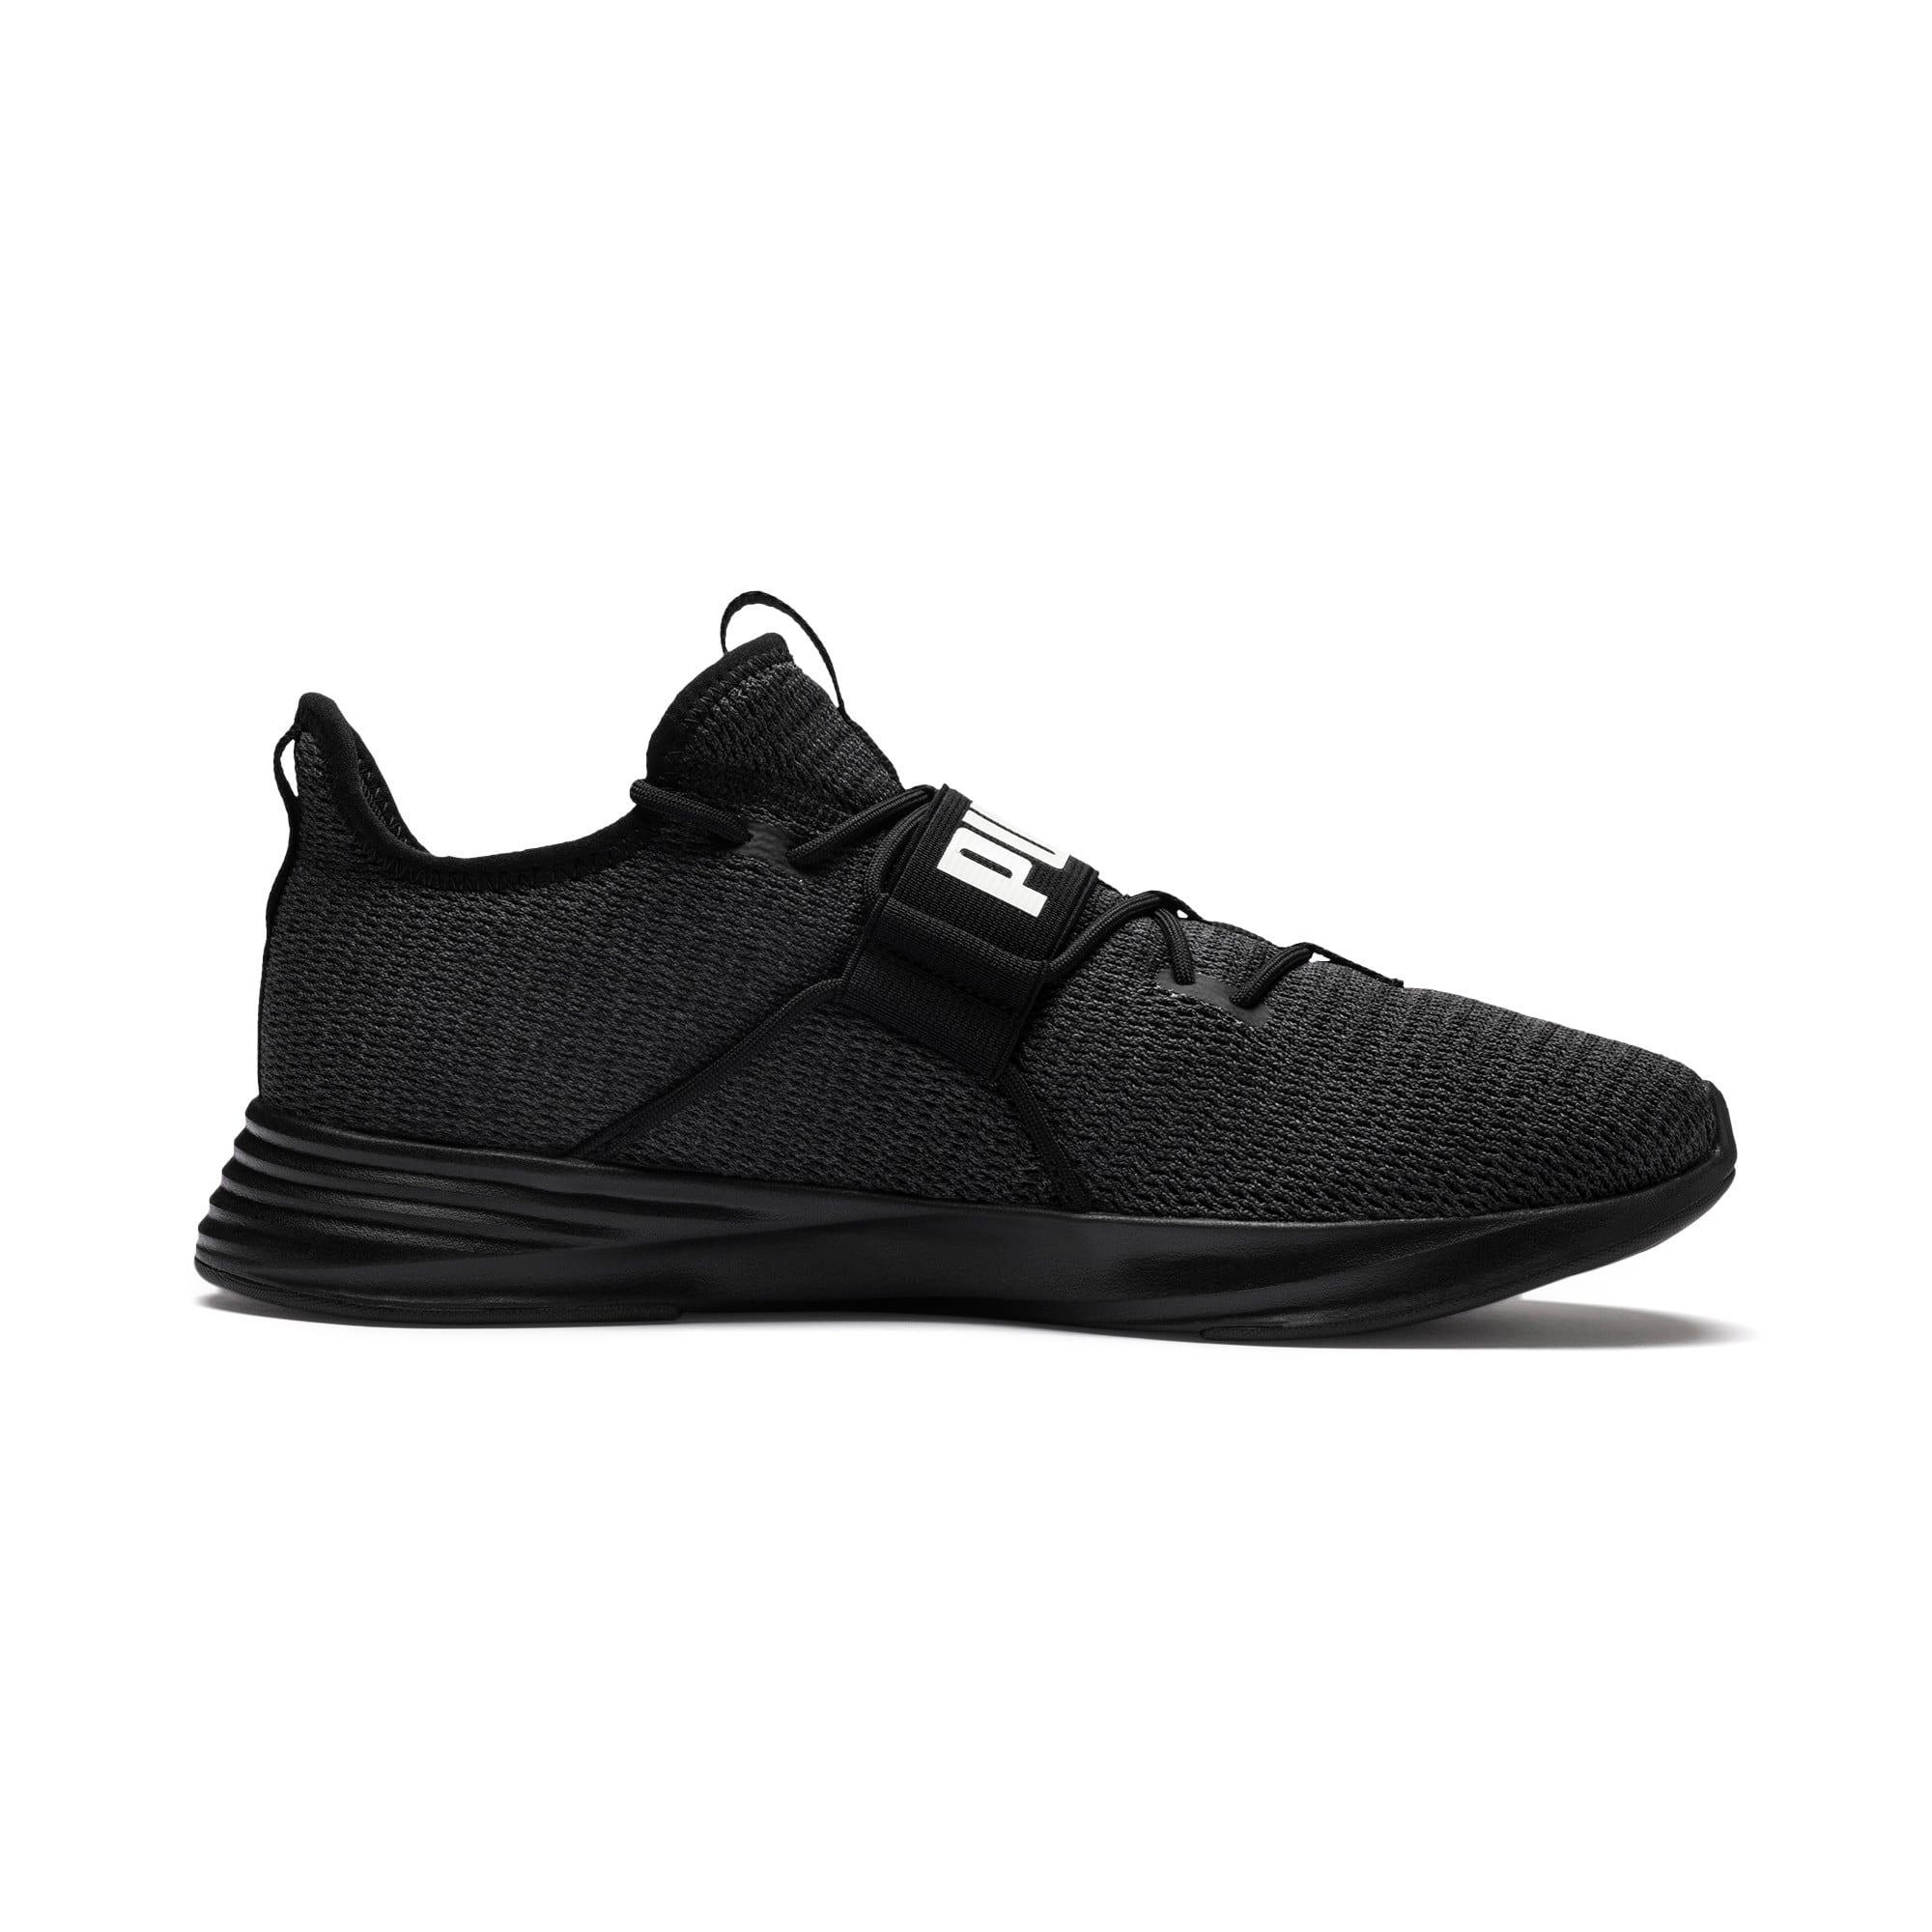 Thumbnail 5 of Persist XT Men's Training Shoes, Puma Black-Asphalt, medium